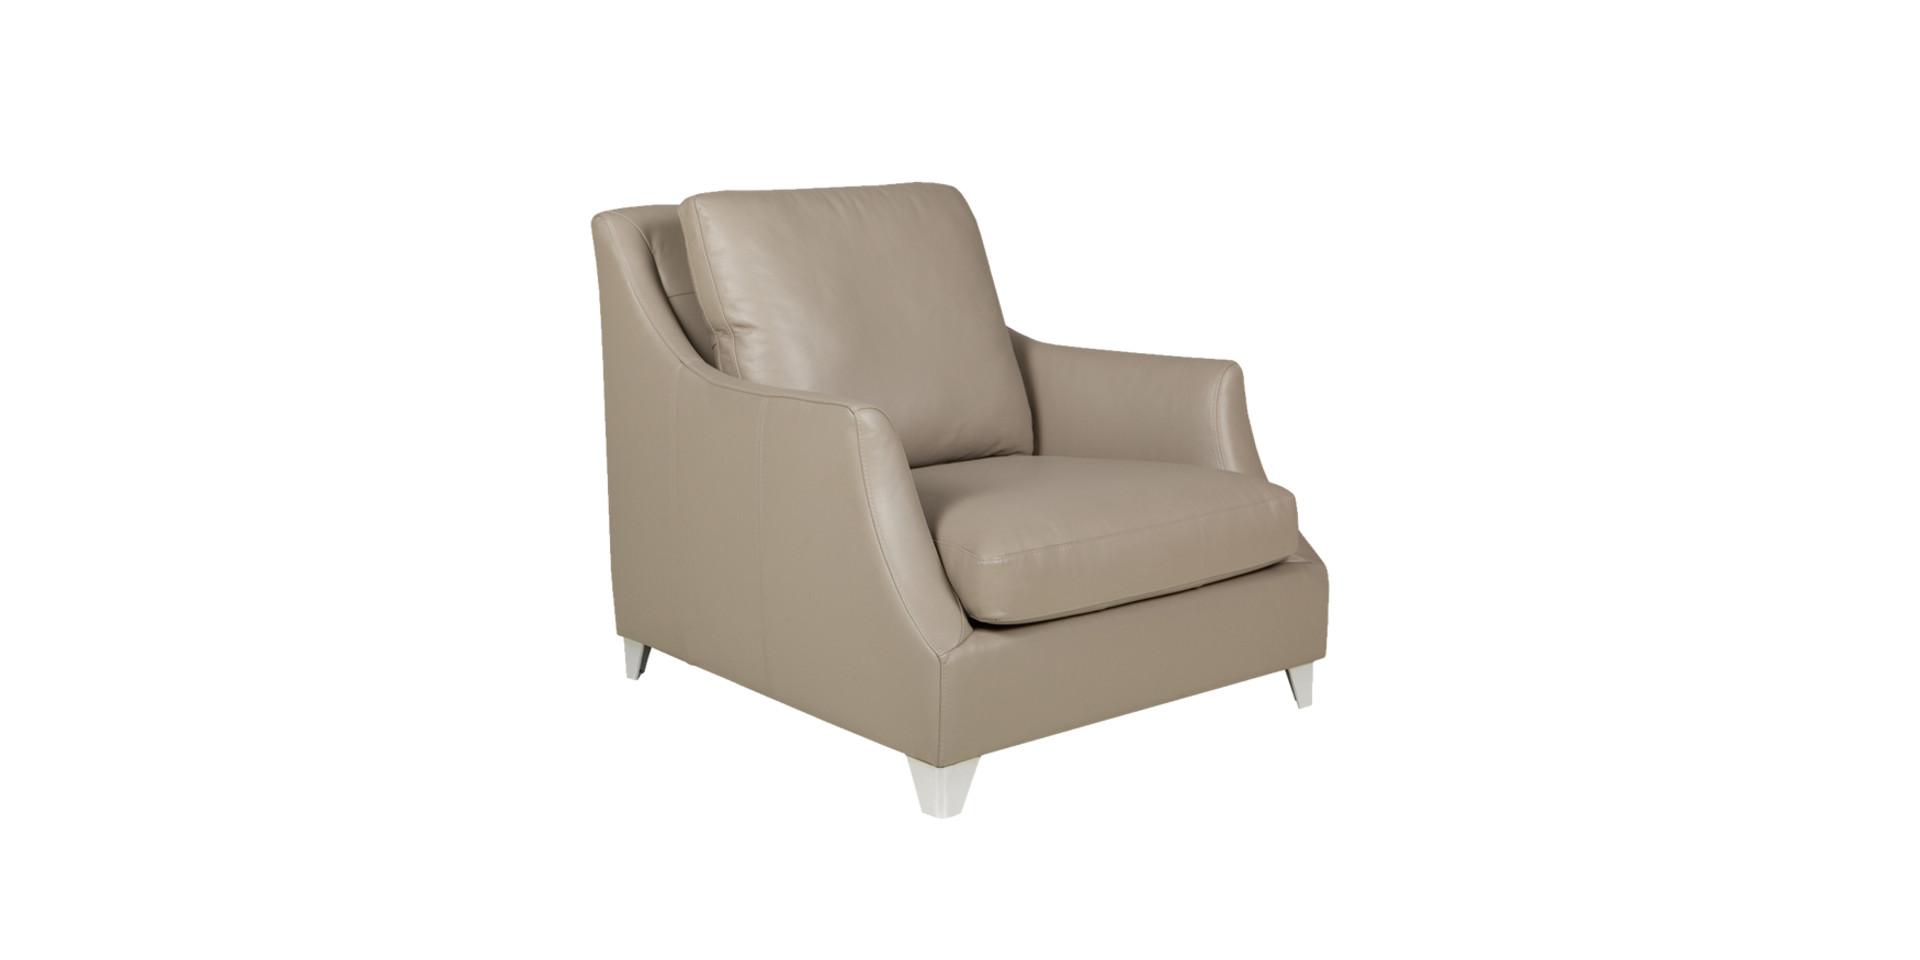 sits-rose-fauteuil-armchair_matrix_light_grey_2_0